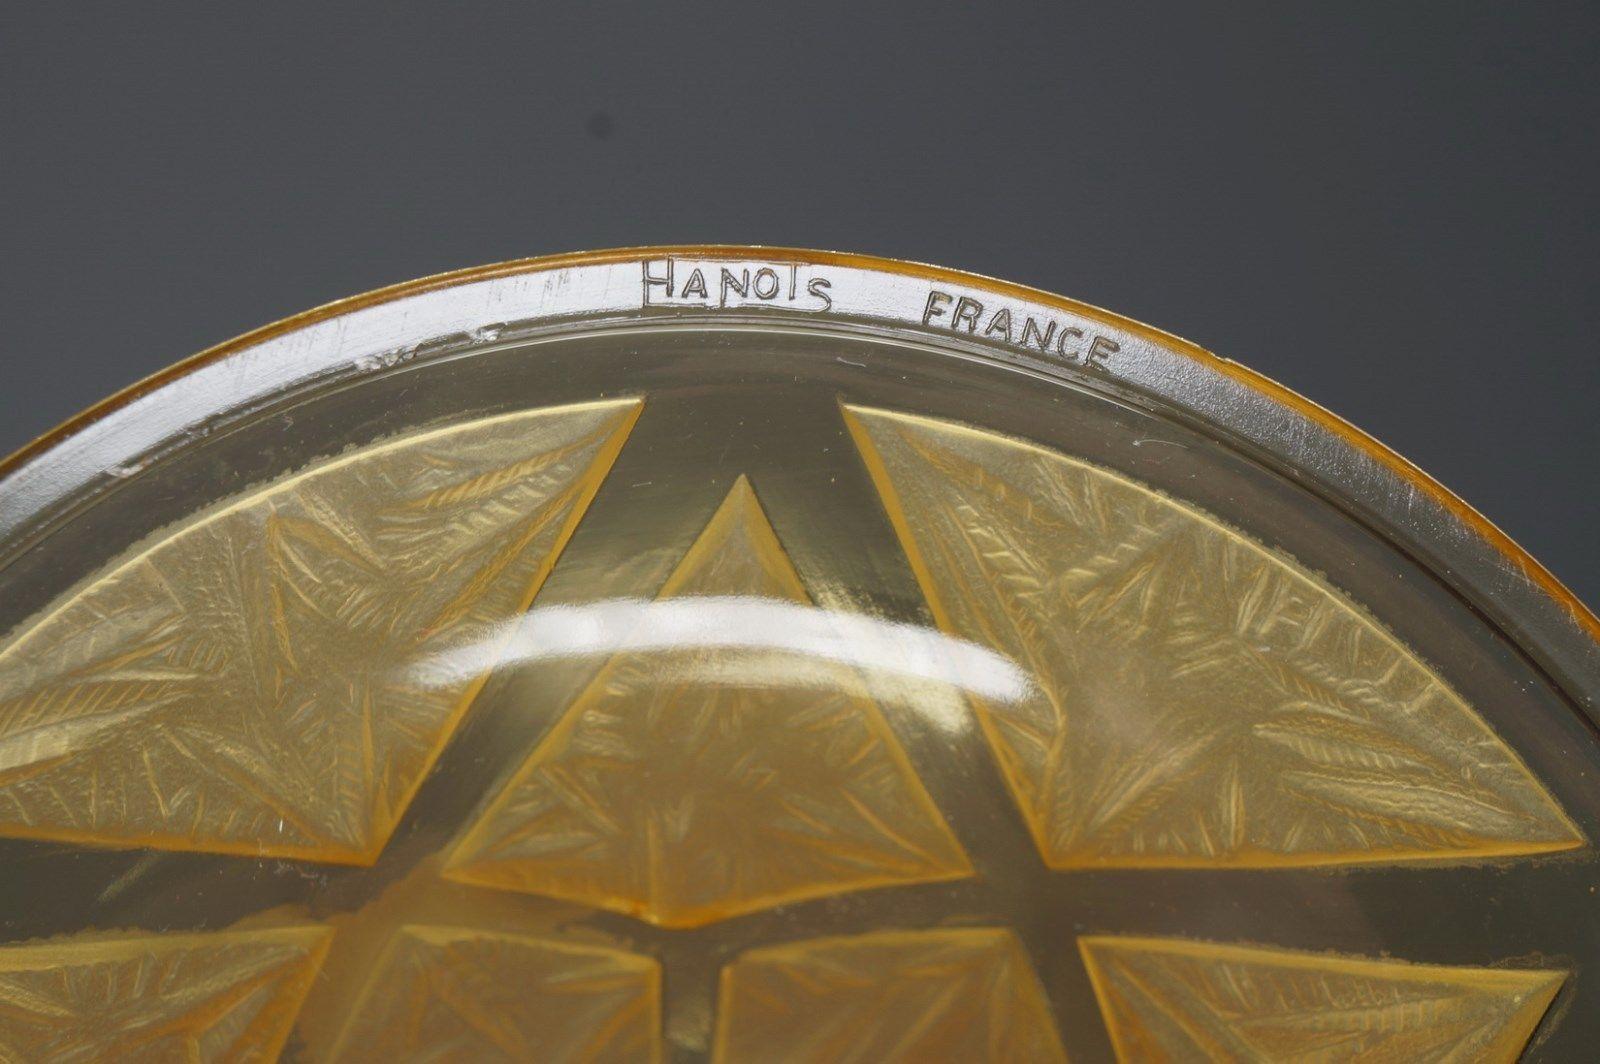 Verreries des Hanots 6灯シャンデリア アンティーク照明